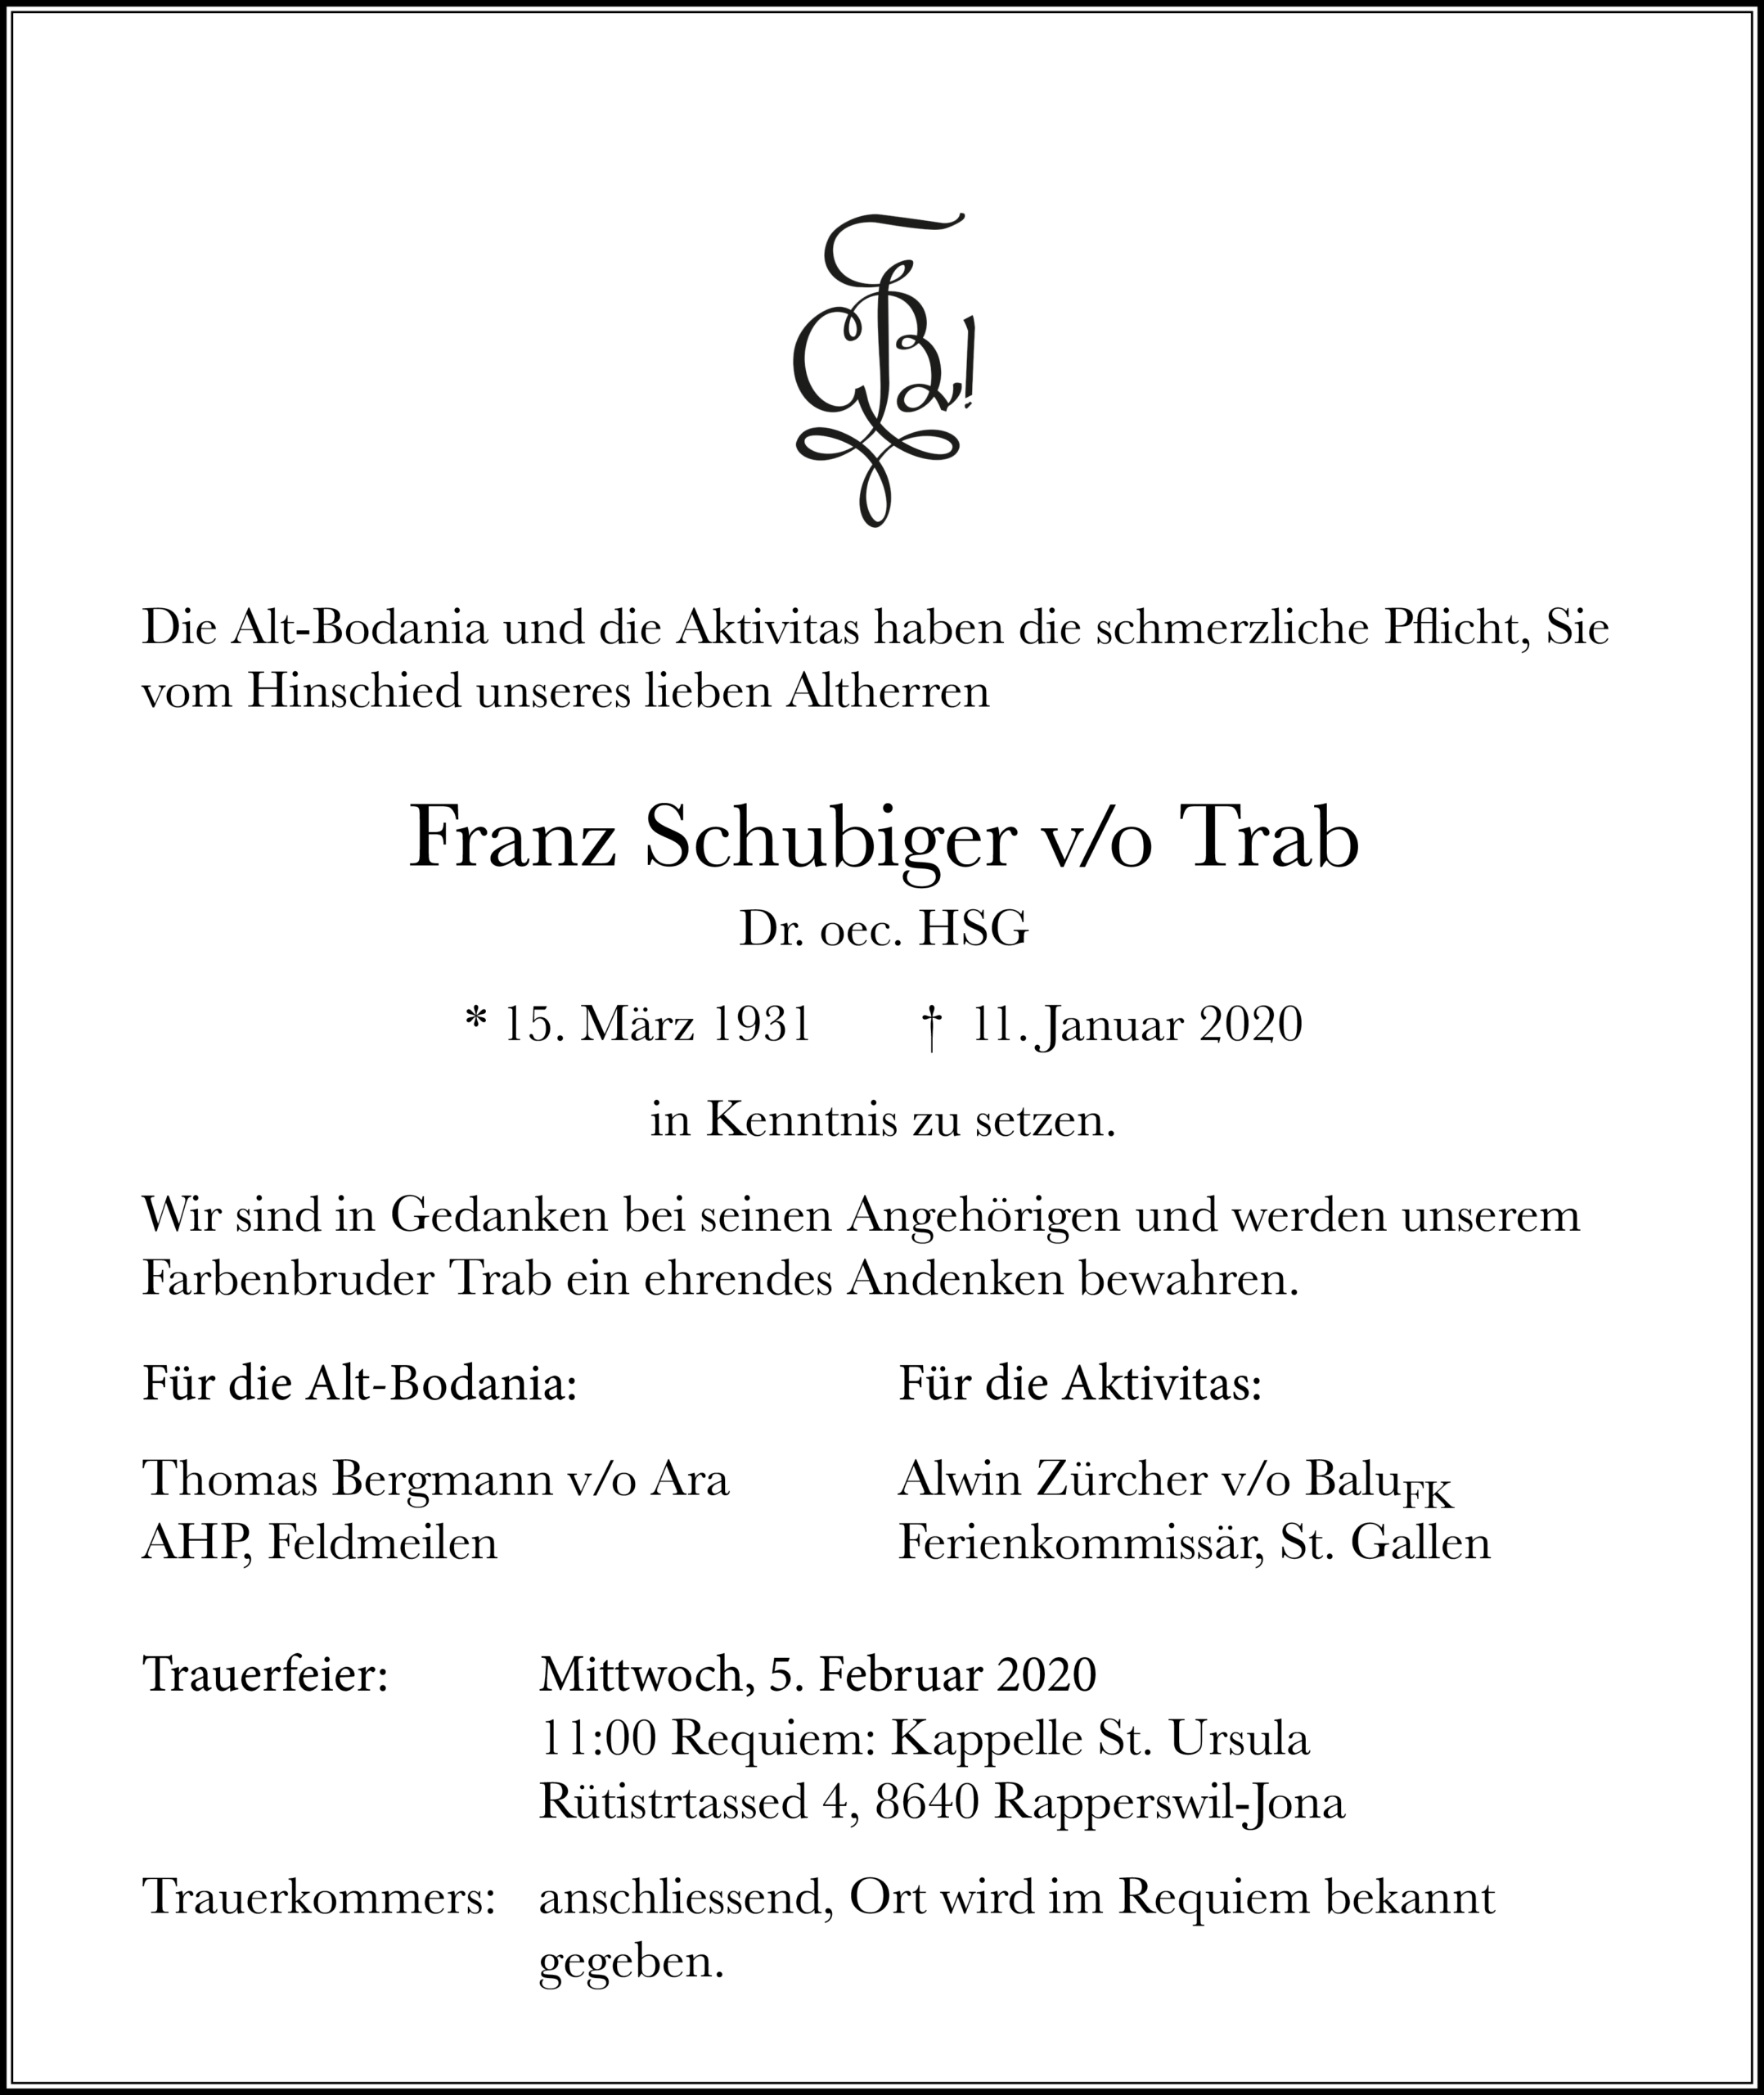 Franz Schubiger v/o Trab †